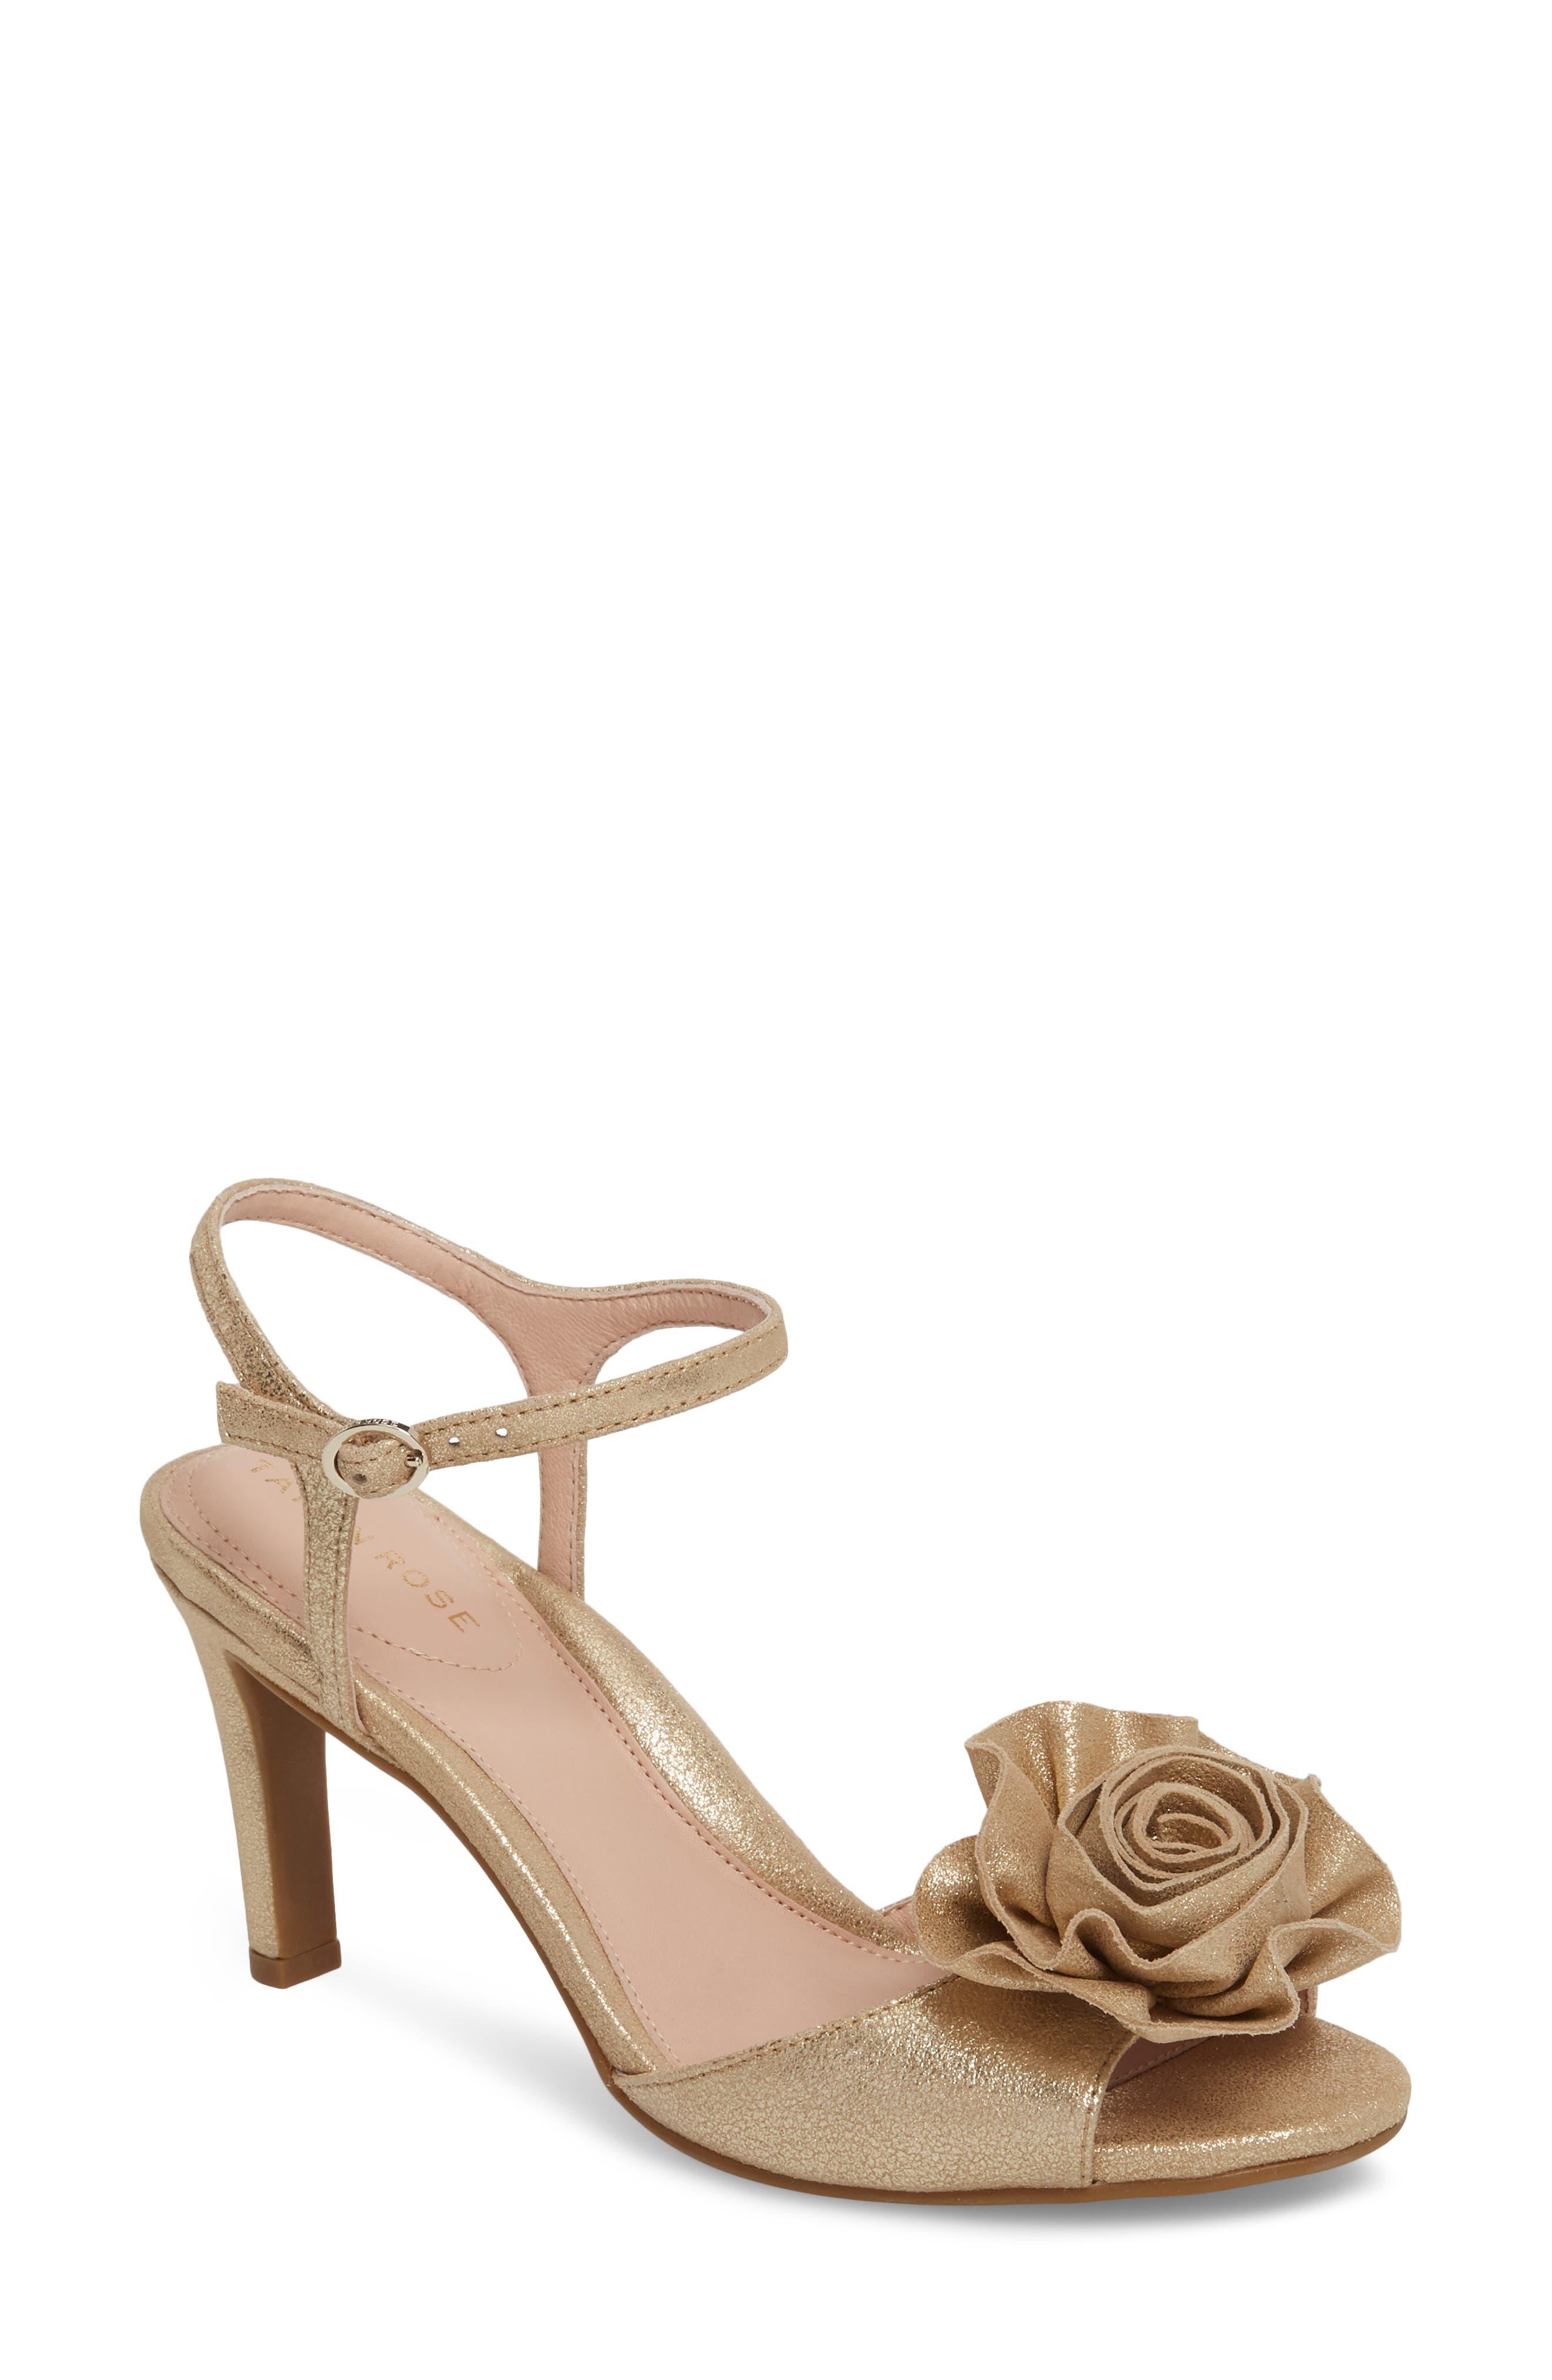 TARYN ROSE Jacklyn Flower Sandal, Main, color, GOLD SHIMMER FABRIC